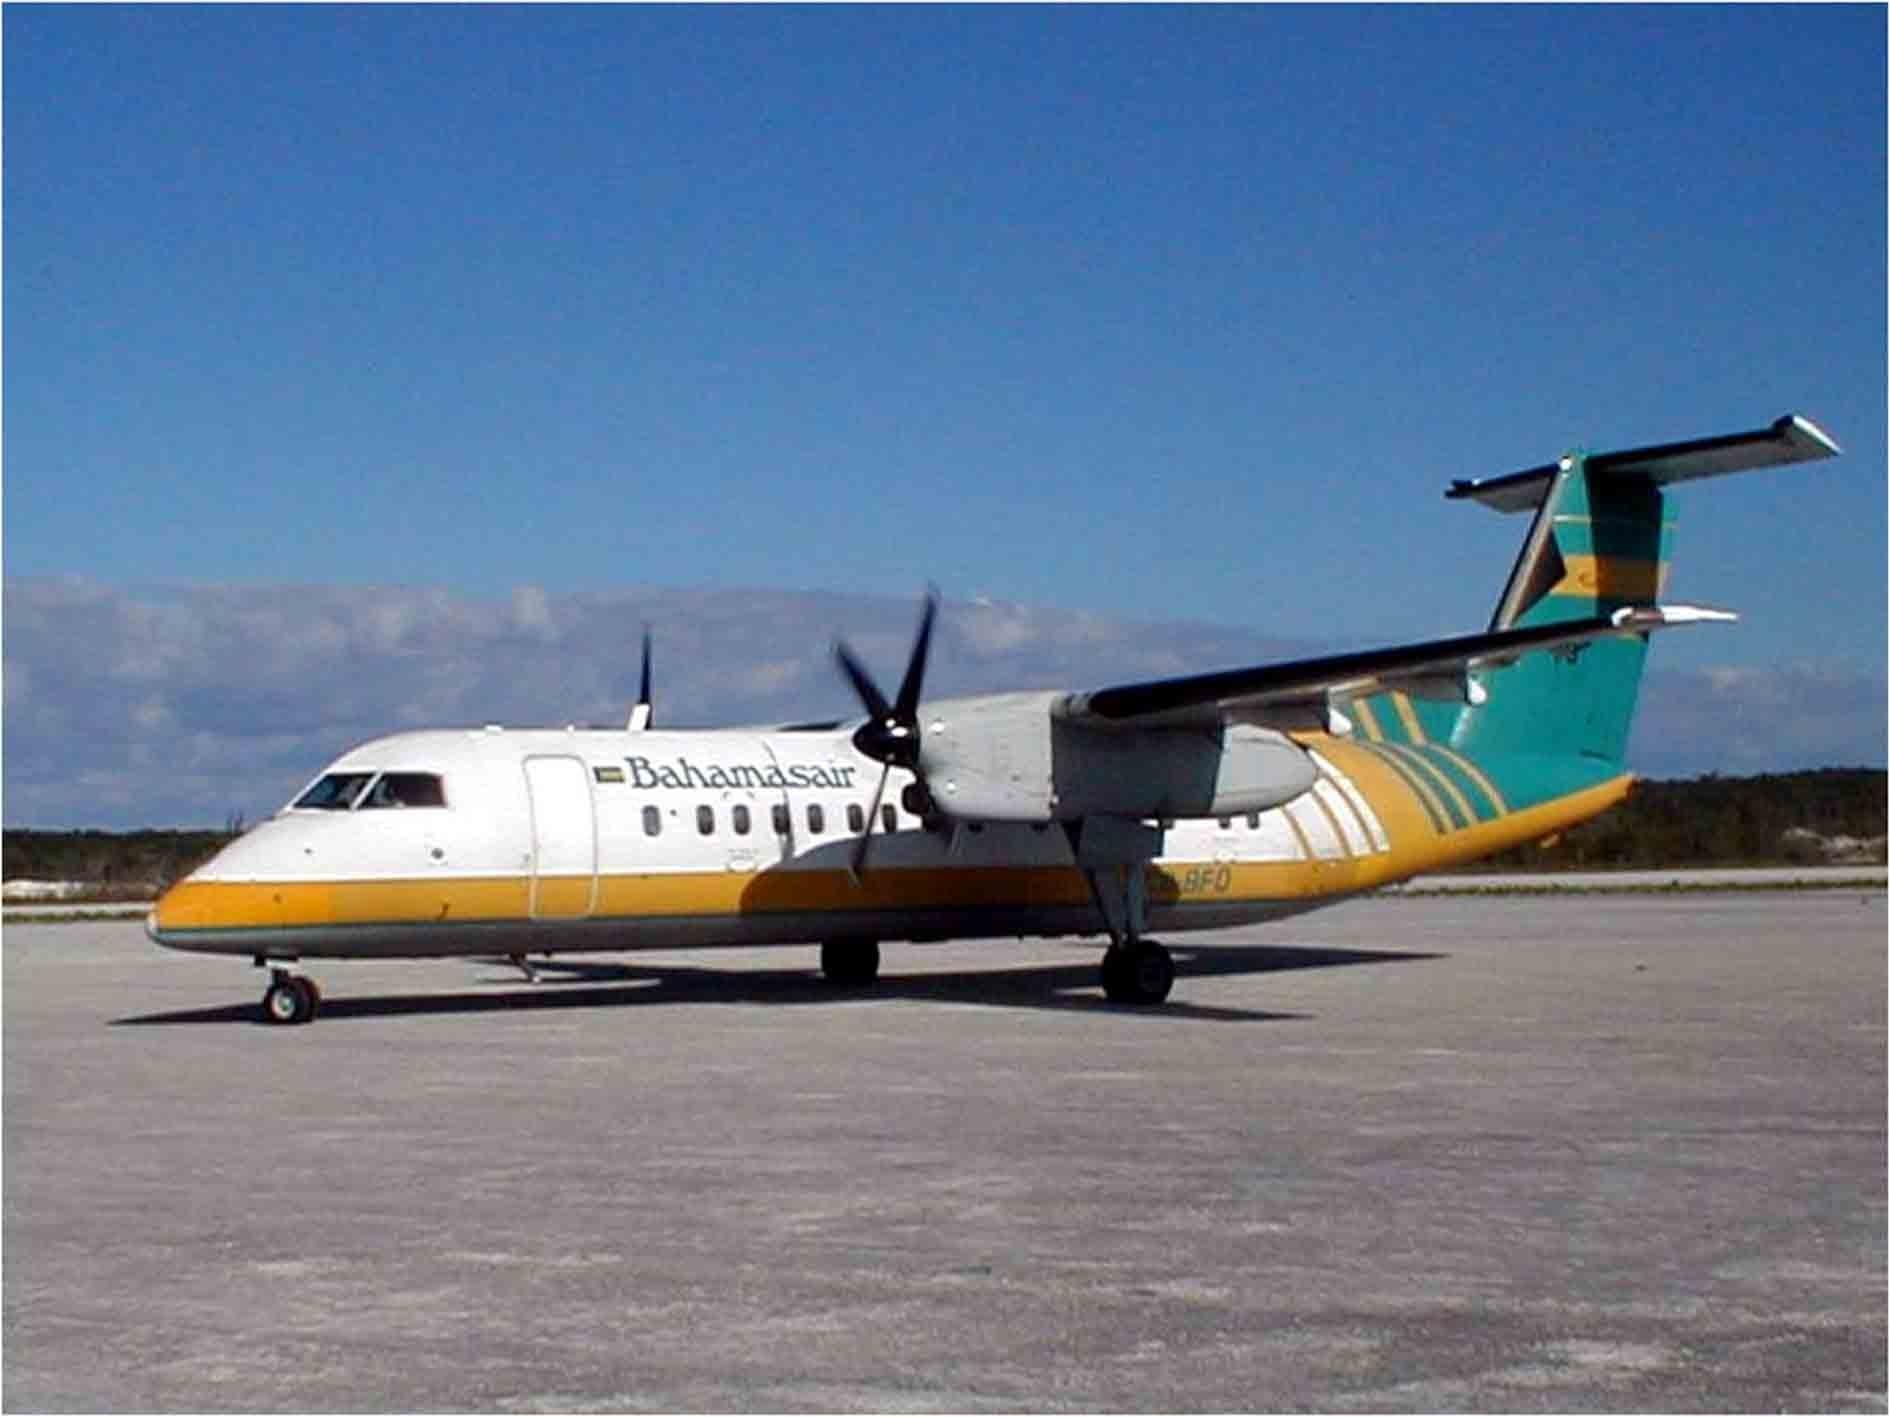 Bahamas Flights with regard to Airlines Traveling To Nassau Bahamas